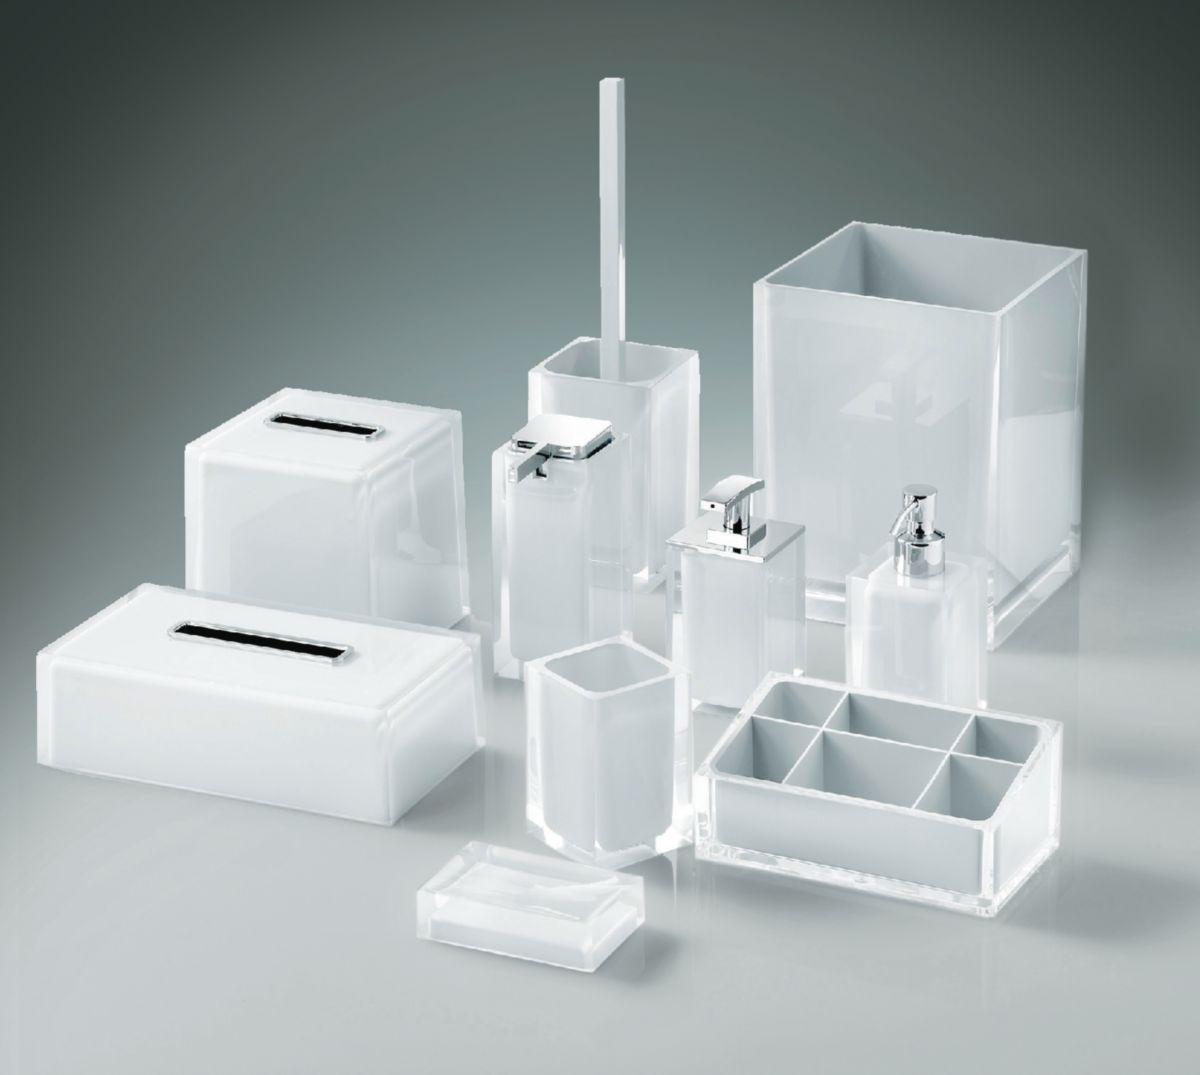 Distributeur de savon avec distributeur en metal chrome a poser blanc réf. RA810200200